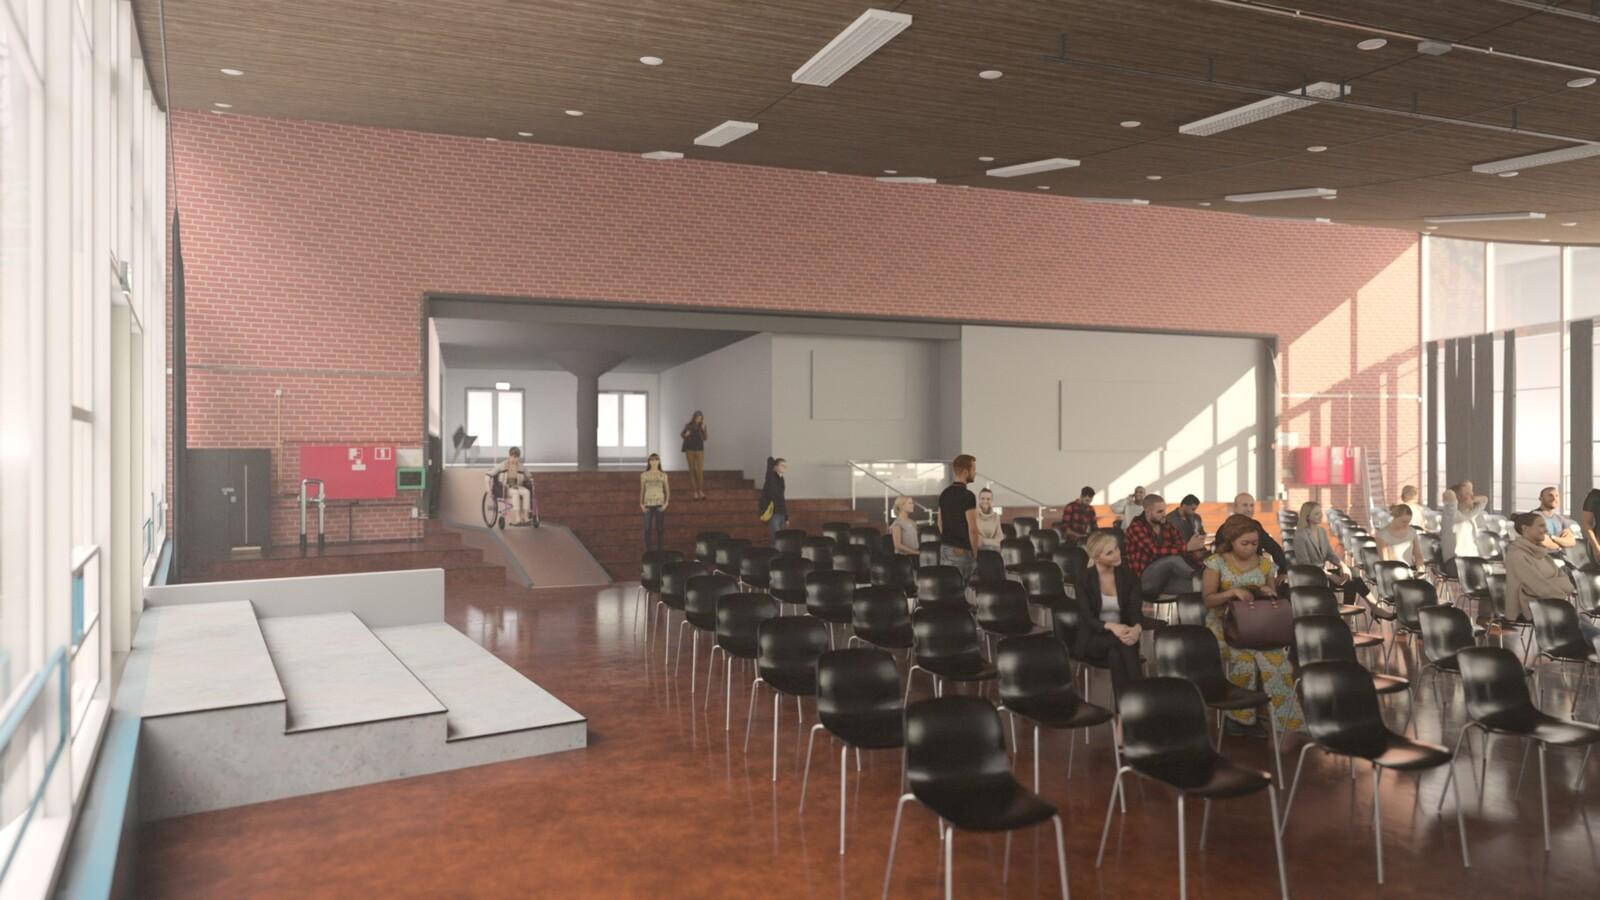 SketchUp 2021 + Thea Render V3 Broedplaats LELY (The Lely Incubator) Auditorium Amsterdam Showroom Final-Scene 13B 20m05s HD1080 1536sp